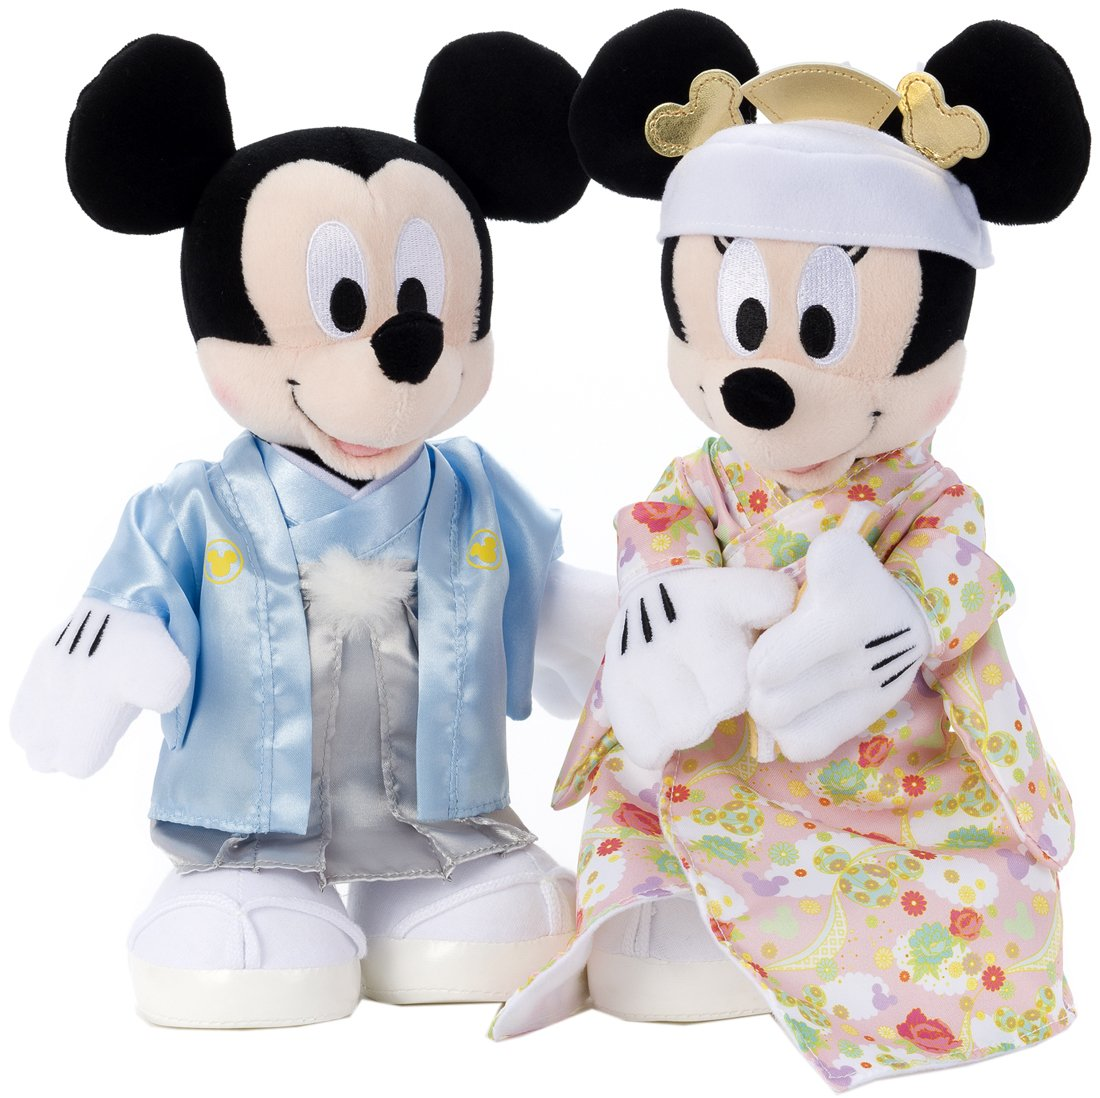 Amazon.com: Bridal Disney / Mickey Mouse u0026 Minnie Mouse Kimono ...